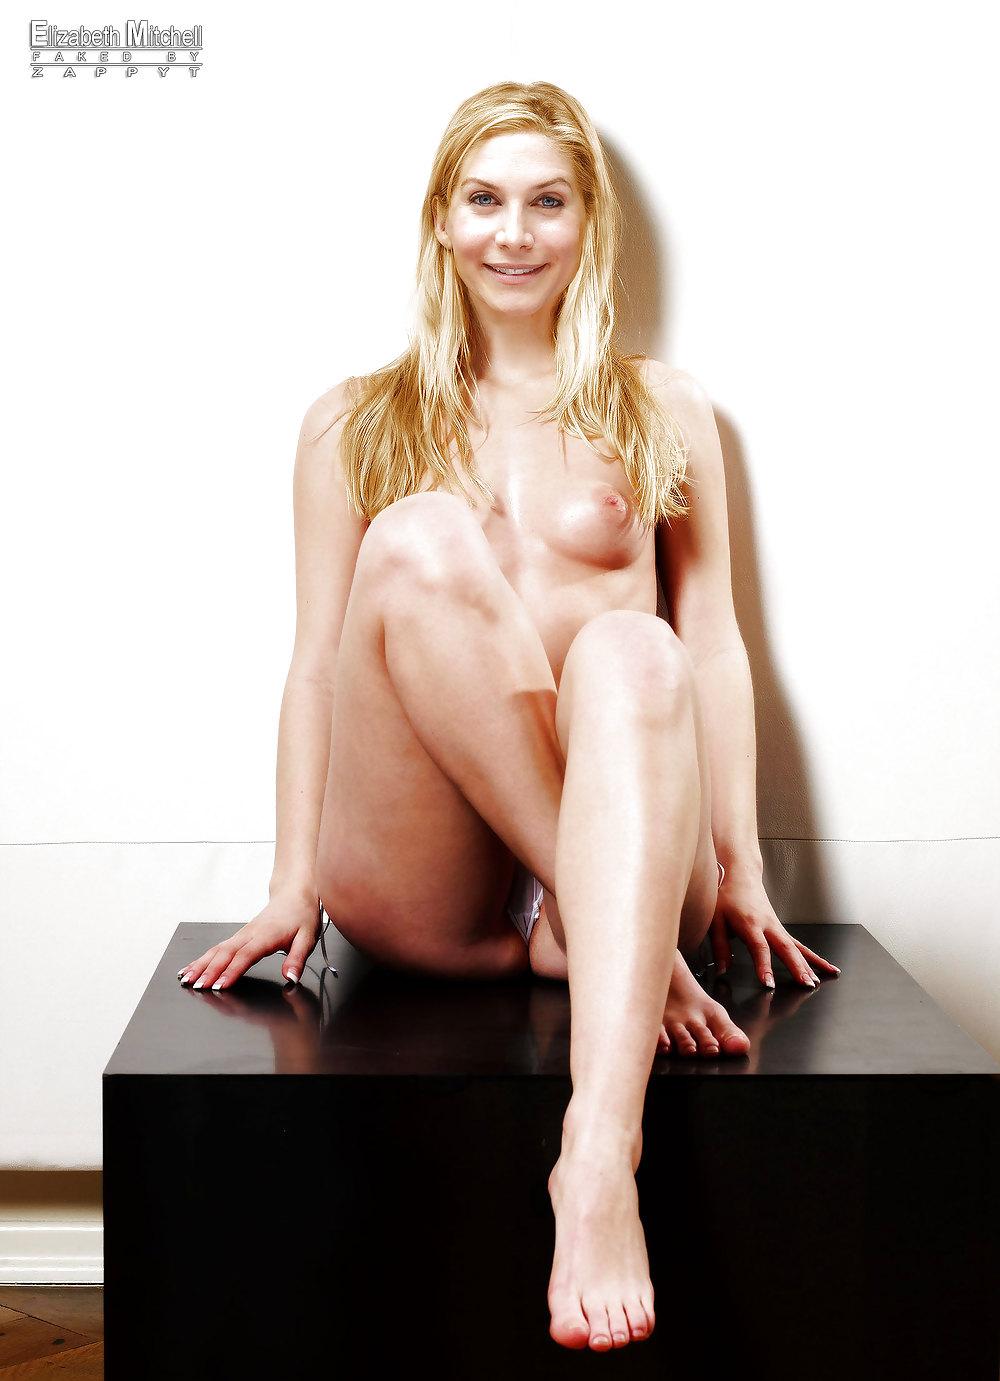 Milf Elizabeth Mitchell Naked Boobs N Pussy Show